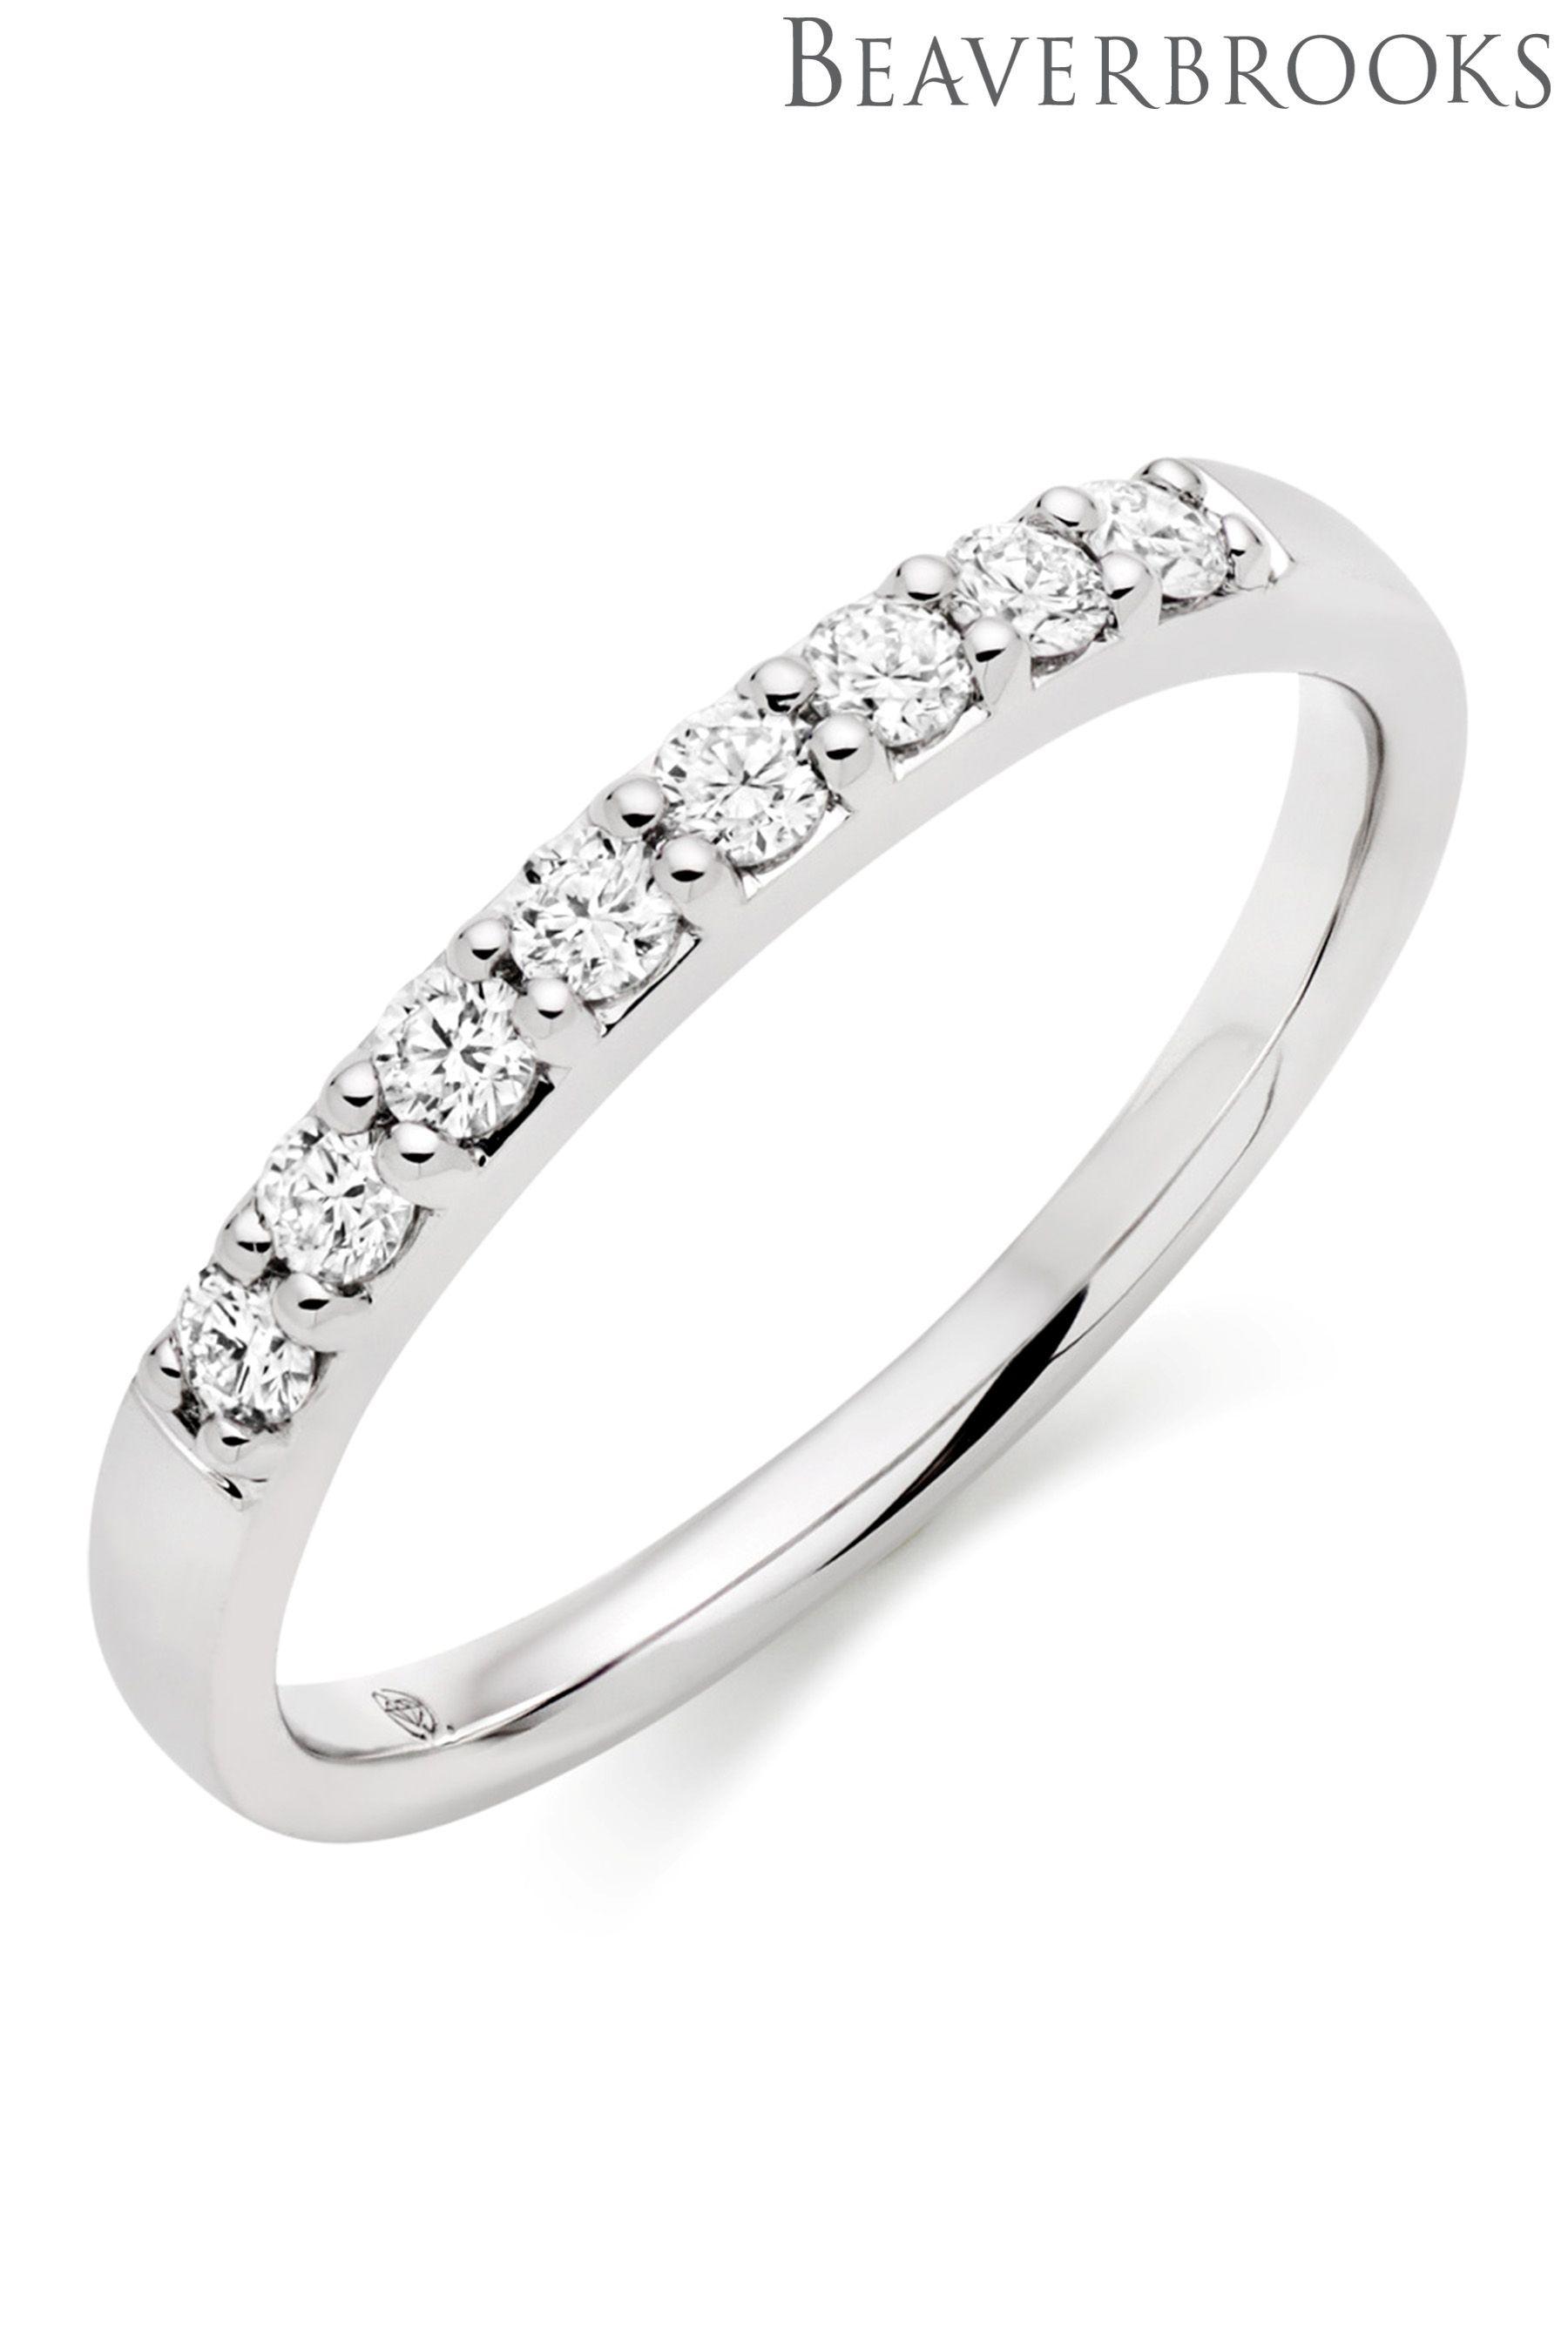 Womens Beaverbrooks Platinum Wedding Ring Silver